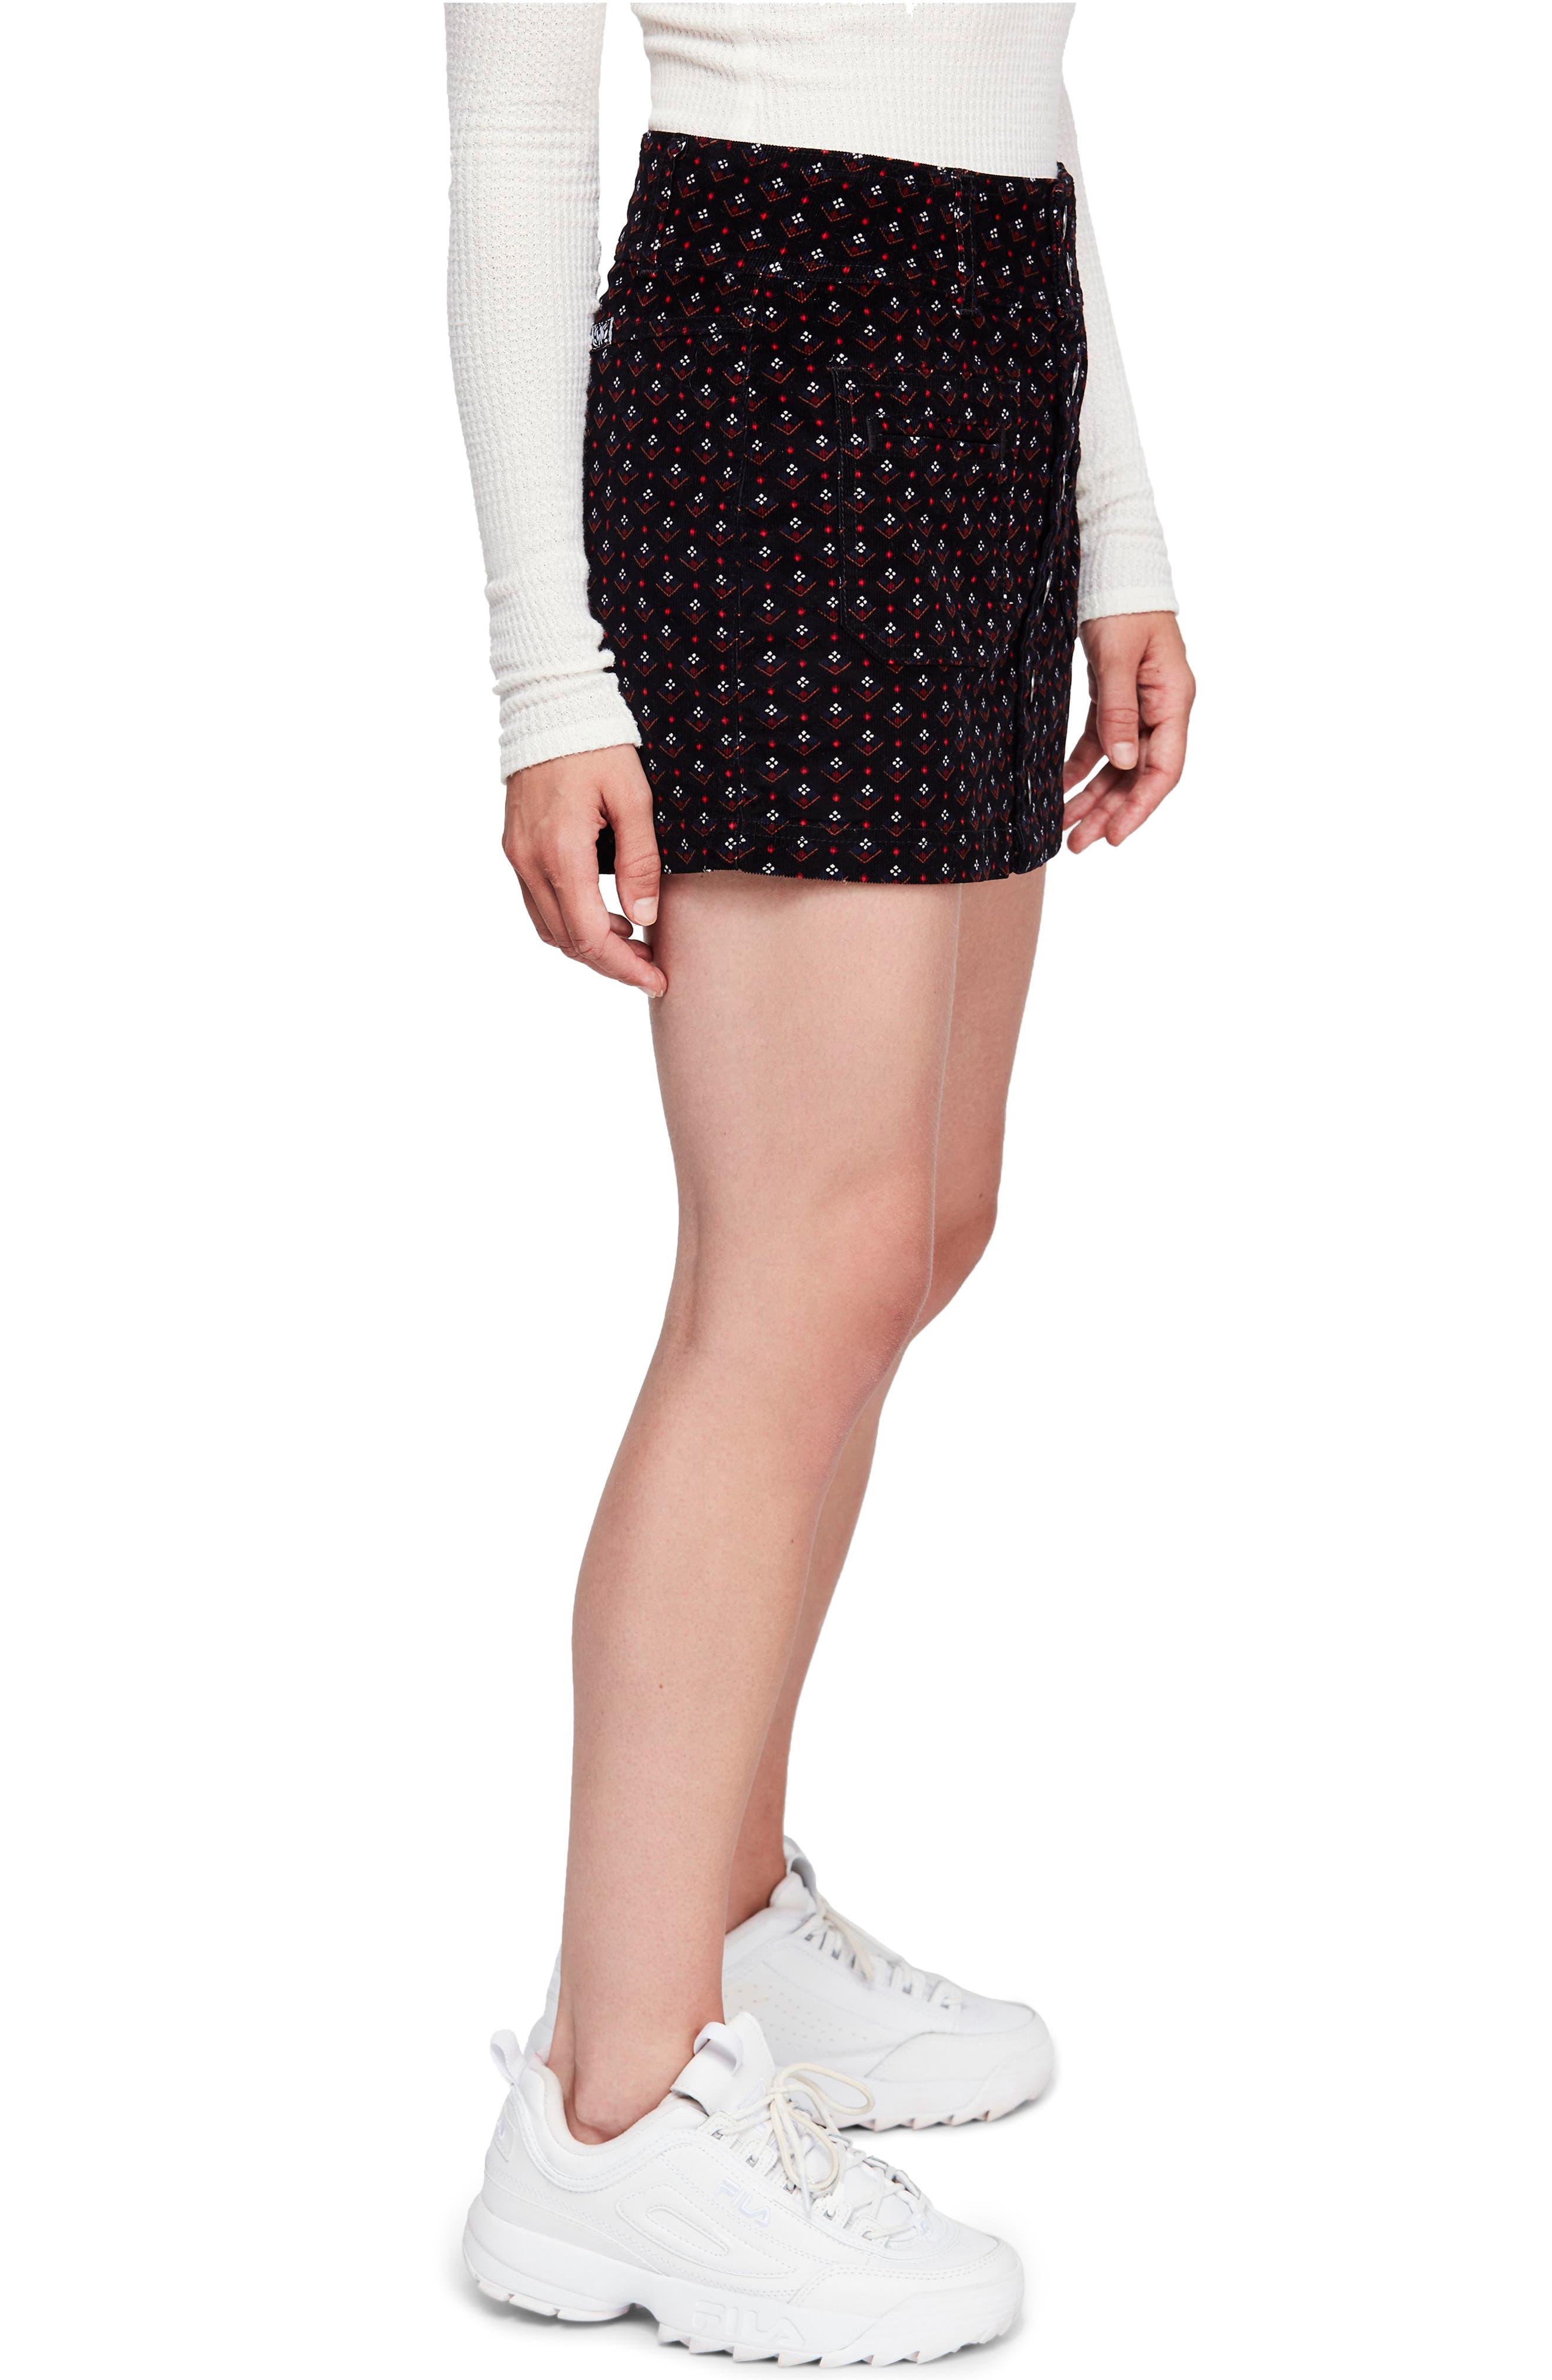 Joanie Print Corduroy Skirt,                             Alternate thumbnail 3, color,                             019